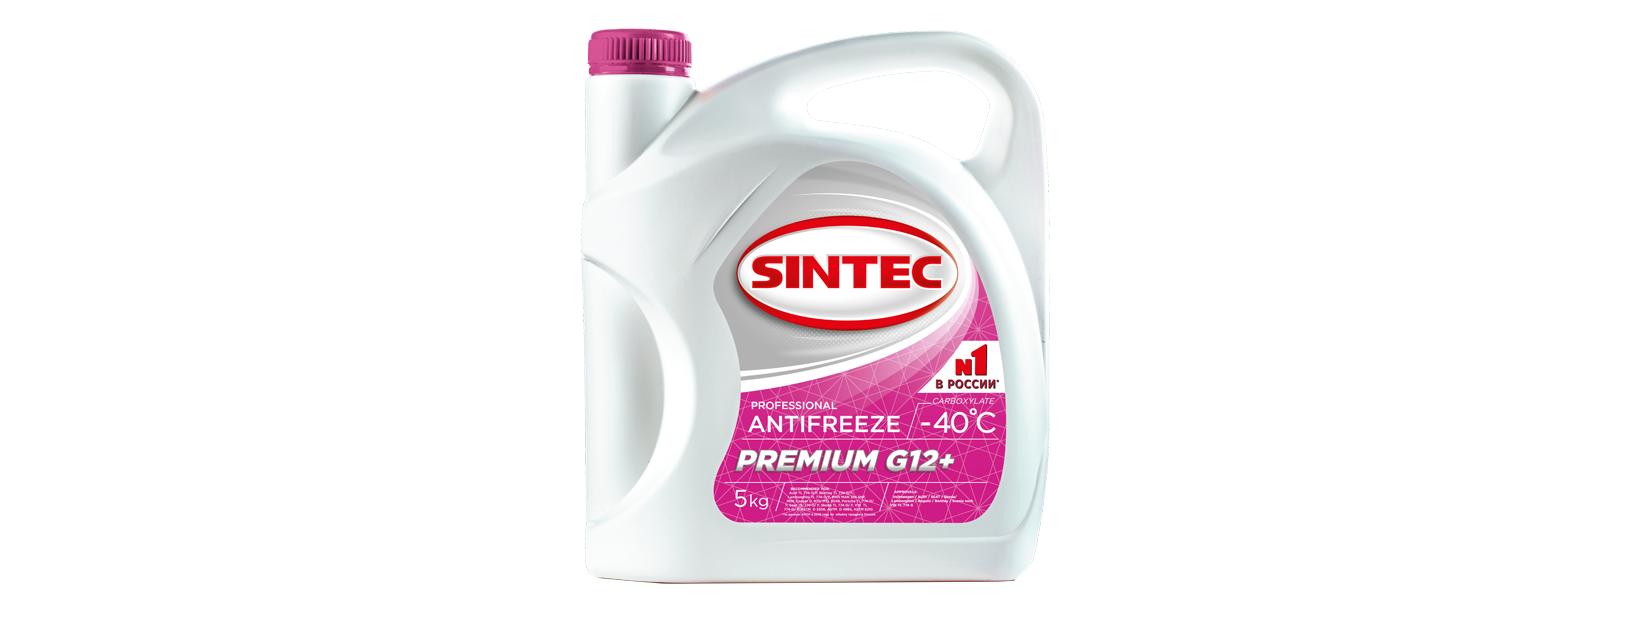 Антифриз G12+ розовый